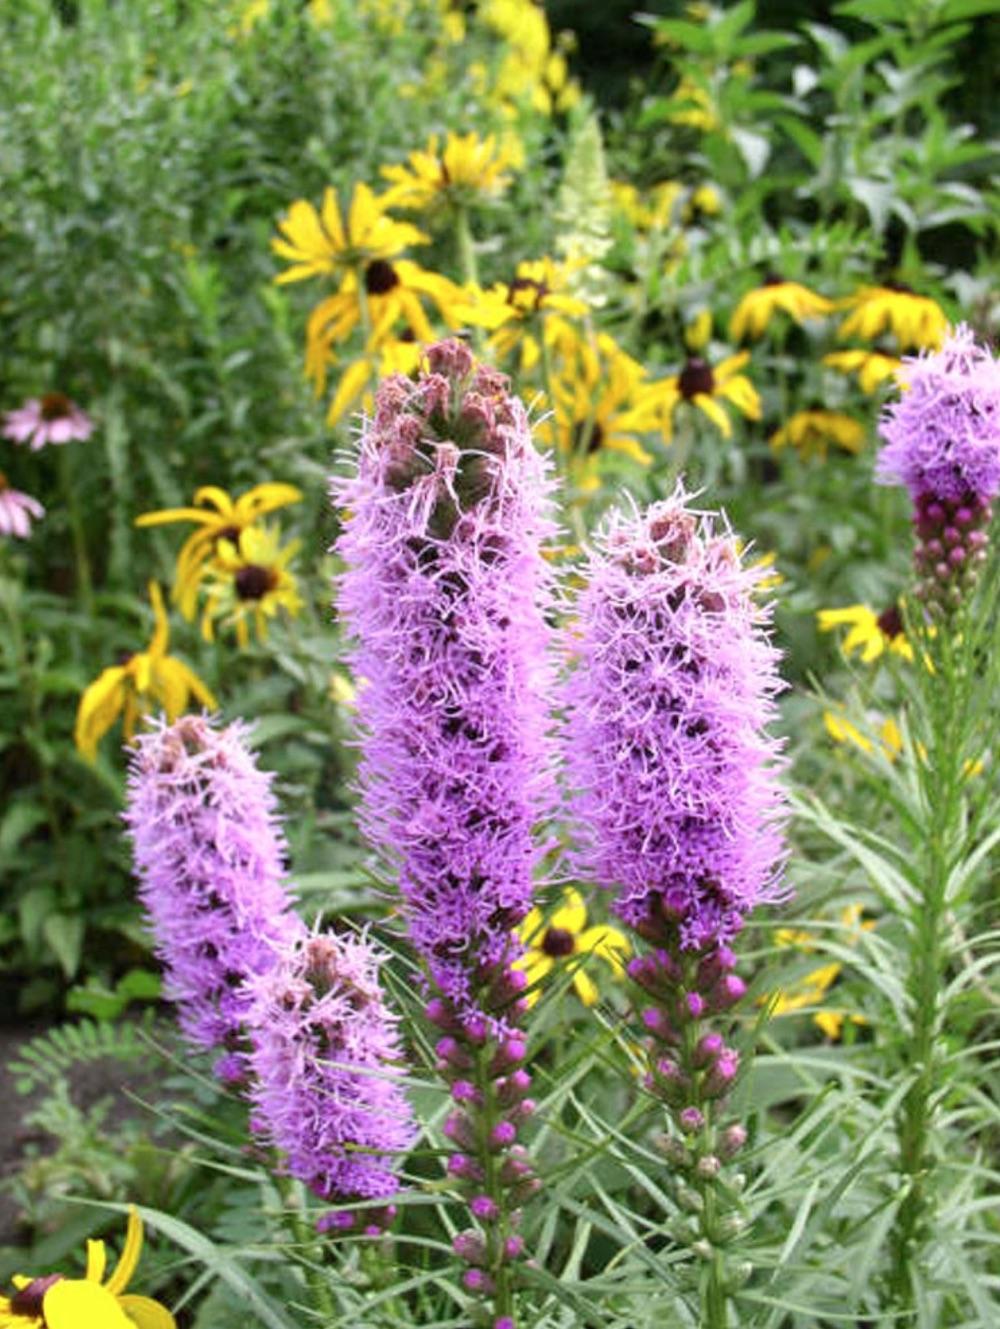 Native Plants Liatris spicata or Dense Blazing Star #MonarchButterflies #Butterflies #SavetheMonarchs #Gardening #Plants #GardenPollinators #AttractMonarchButterflies #NectarRichPlants #BeneficialForPollinators